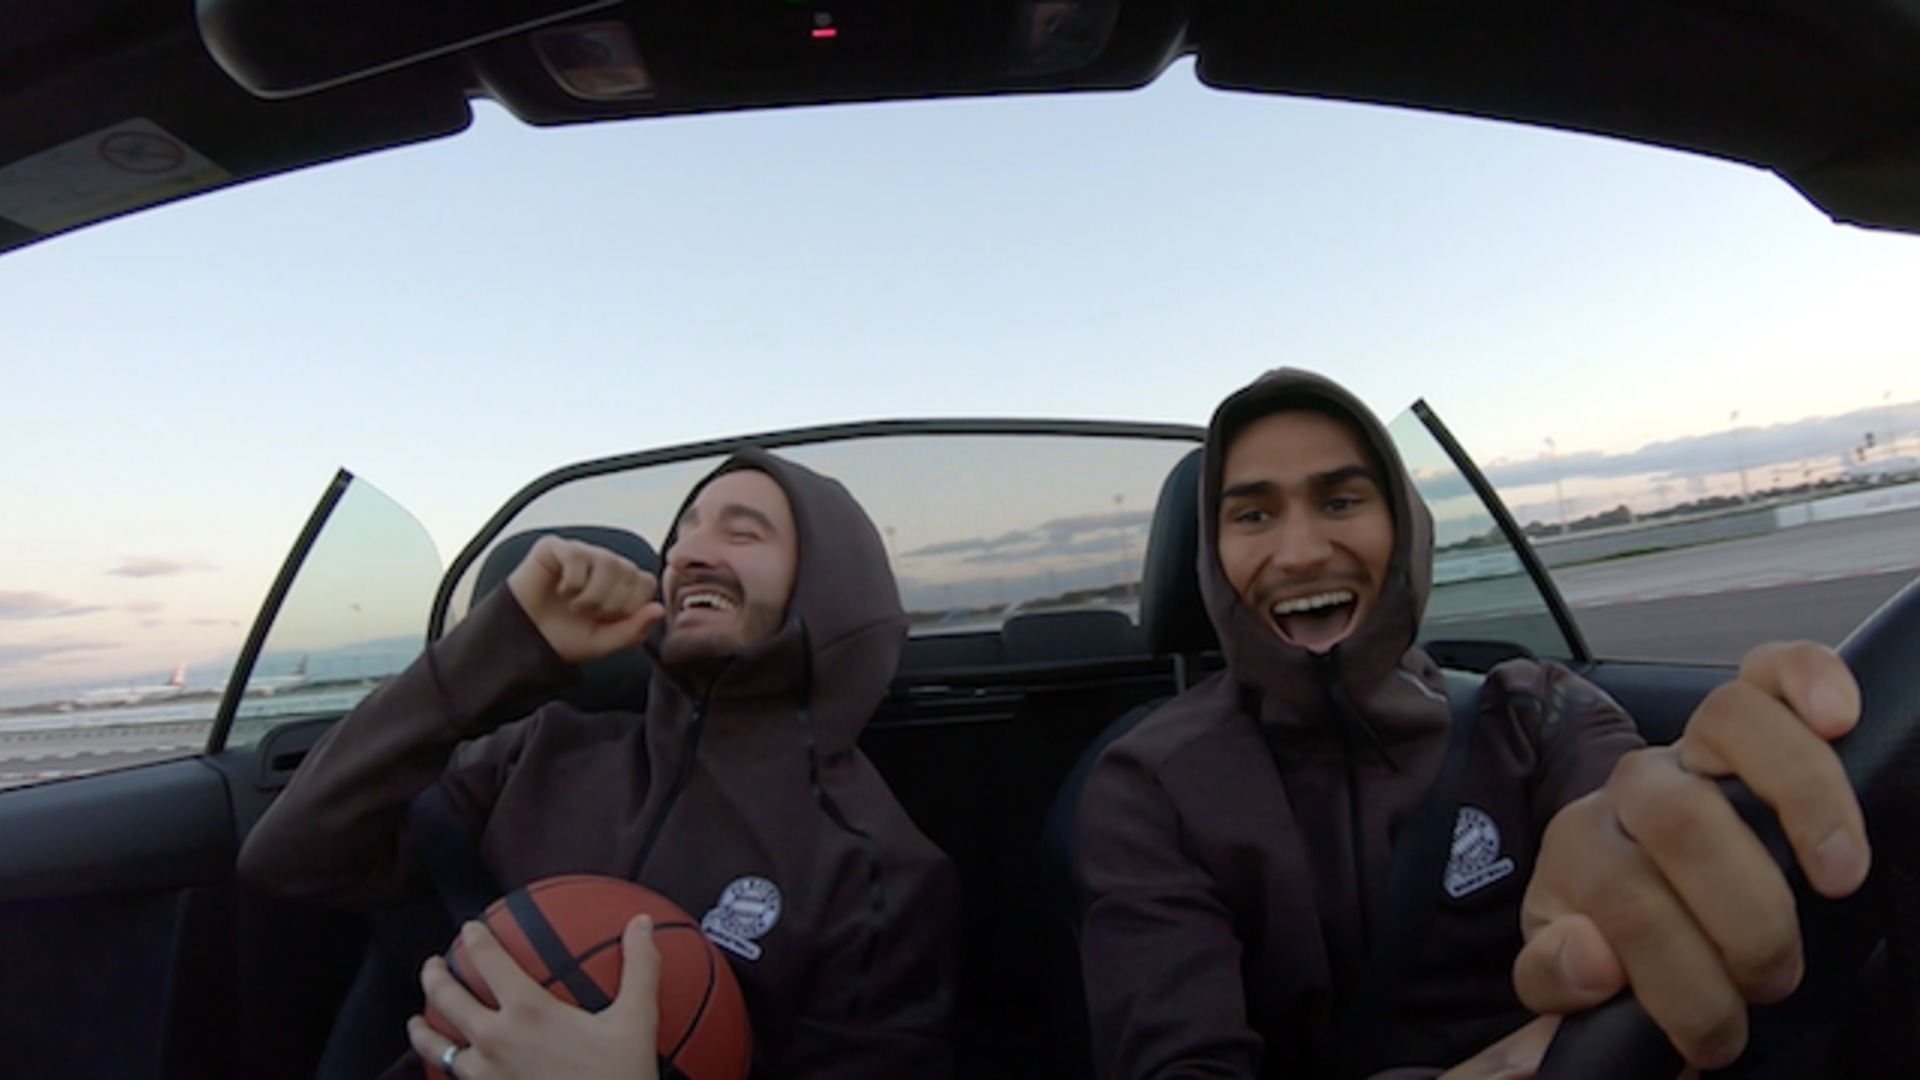 FC Bayern München basketballers receive new Audi courtesy cars